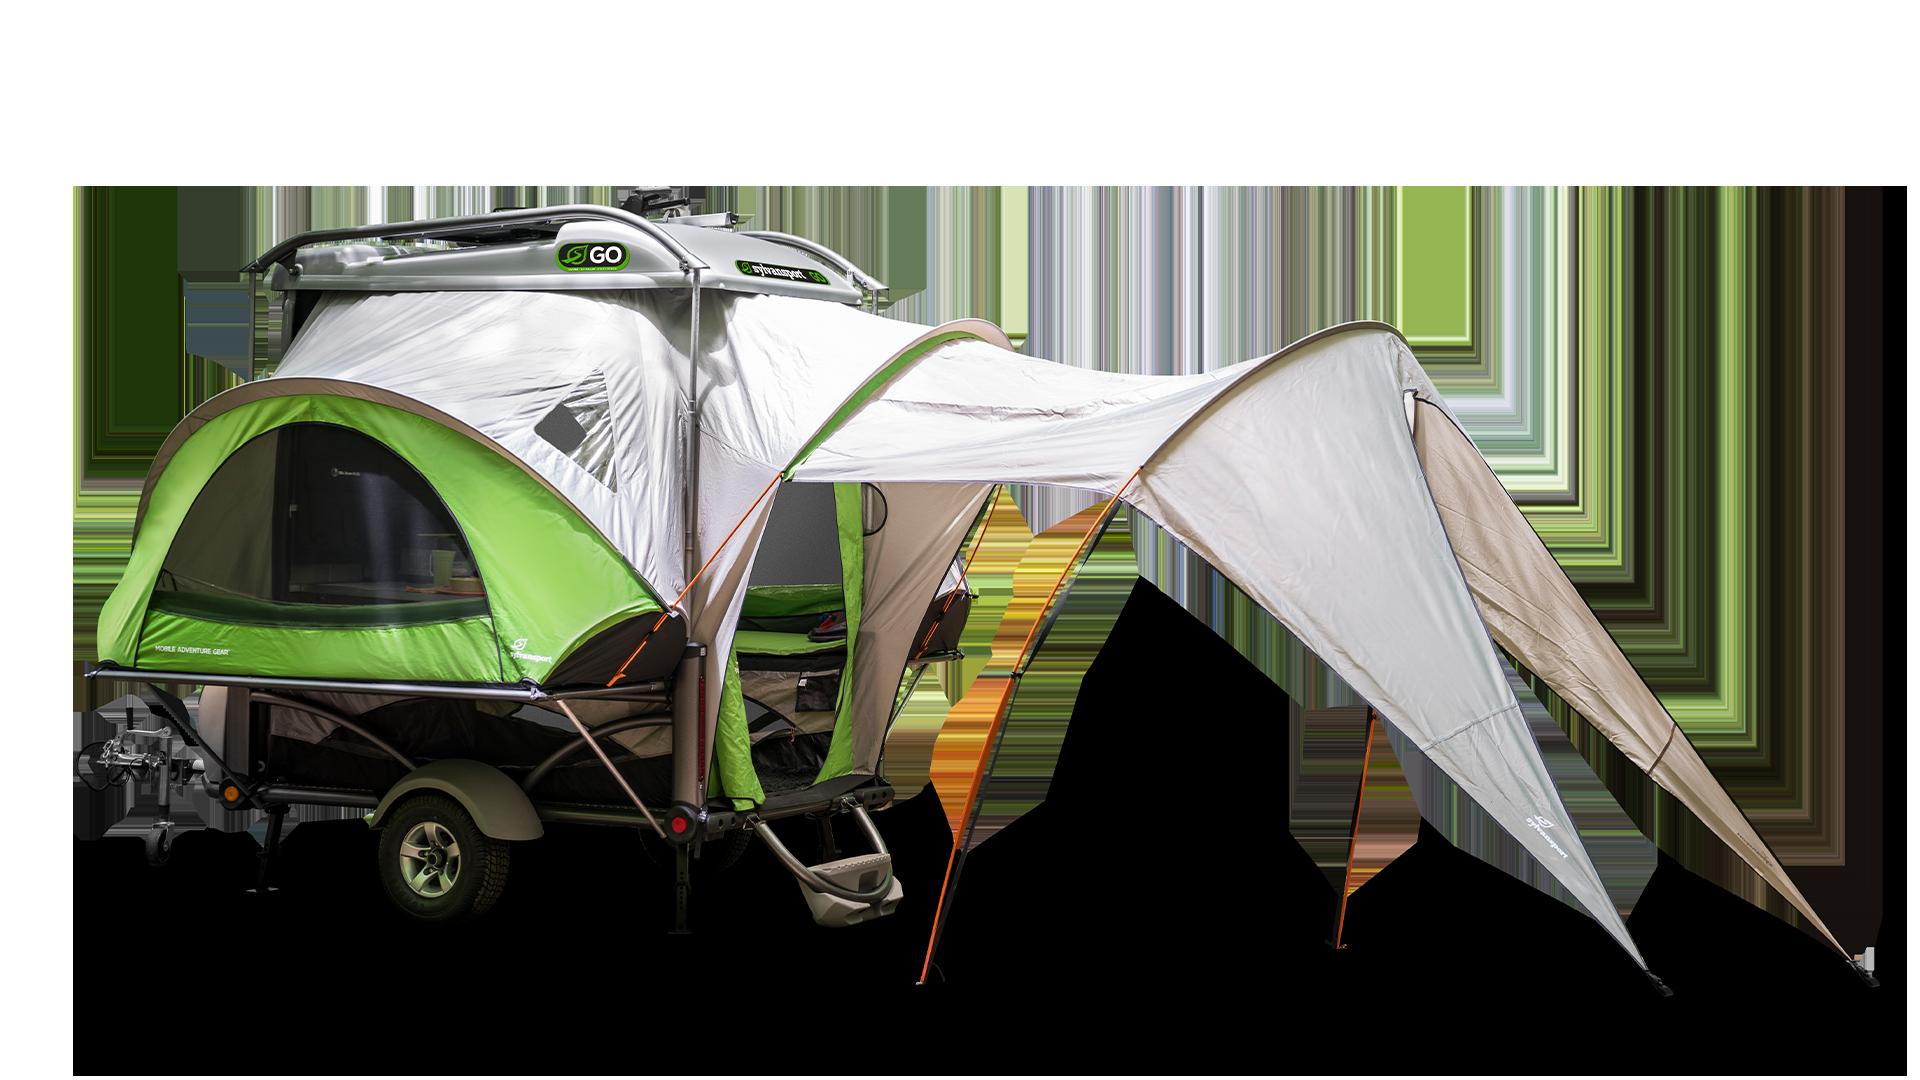 The exterior of the 2020 SylvanSport Go pop-up camper.